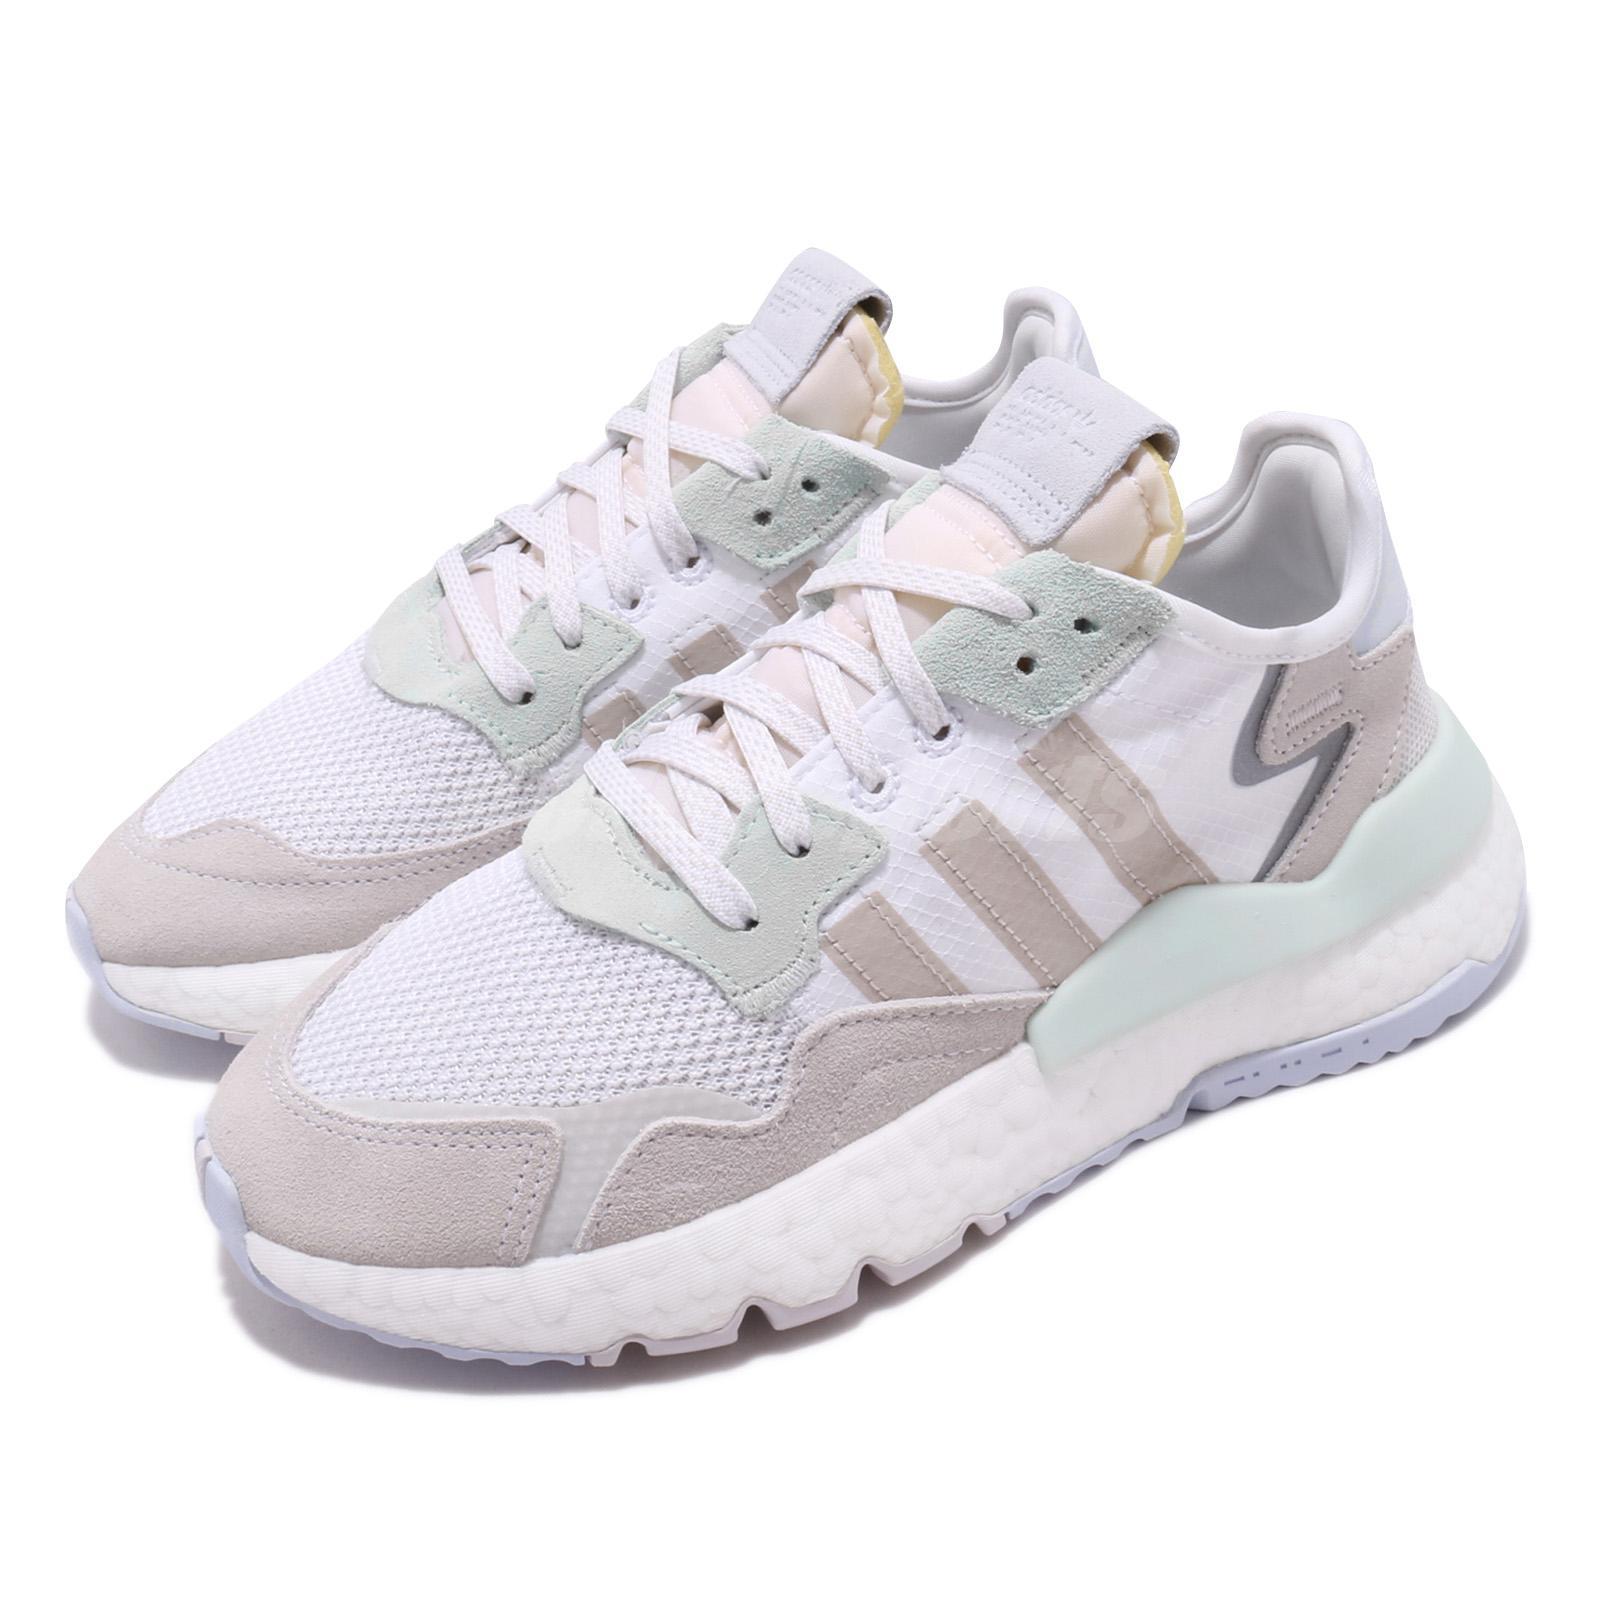 Details about adidas Originals Nite Jogger W White Mint Blue Reflective Womens Shoes EG9197